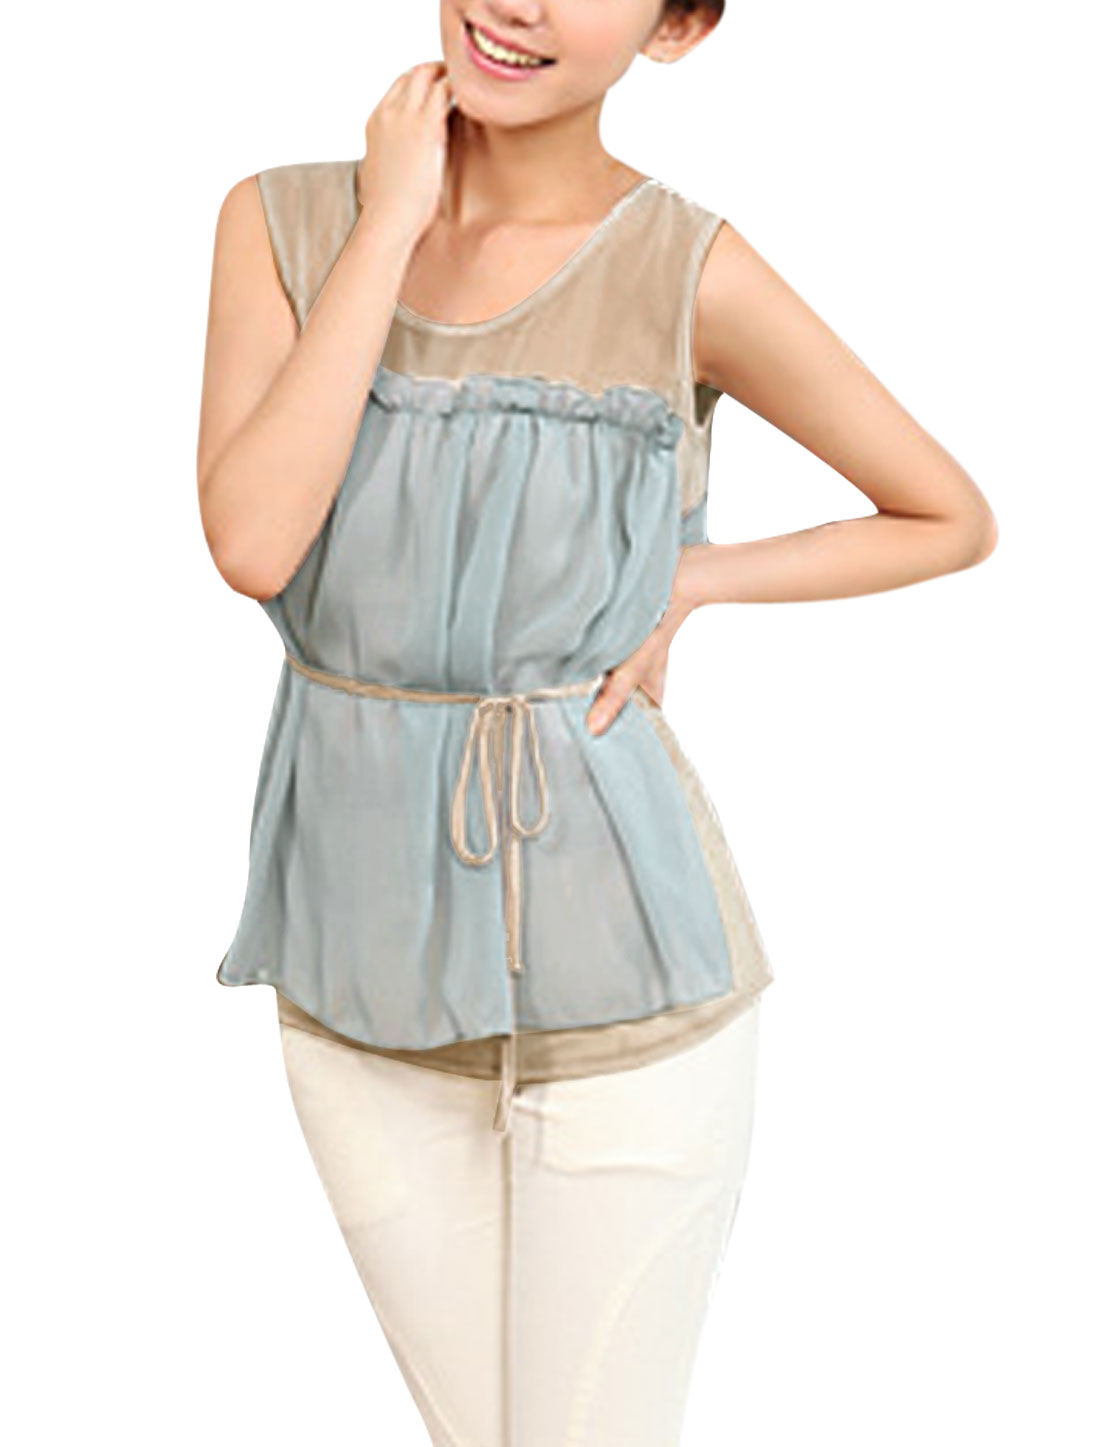 Lady Chic Semi-sheer Straps Tunic Tank Top Camel Light Gray XS